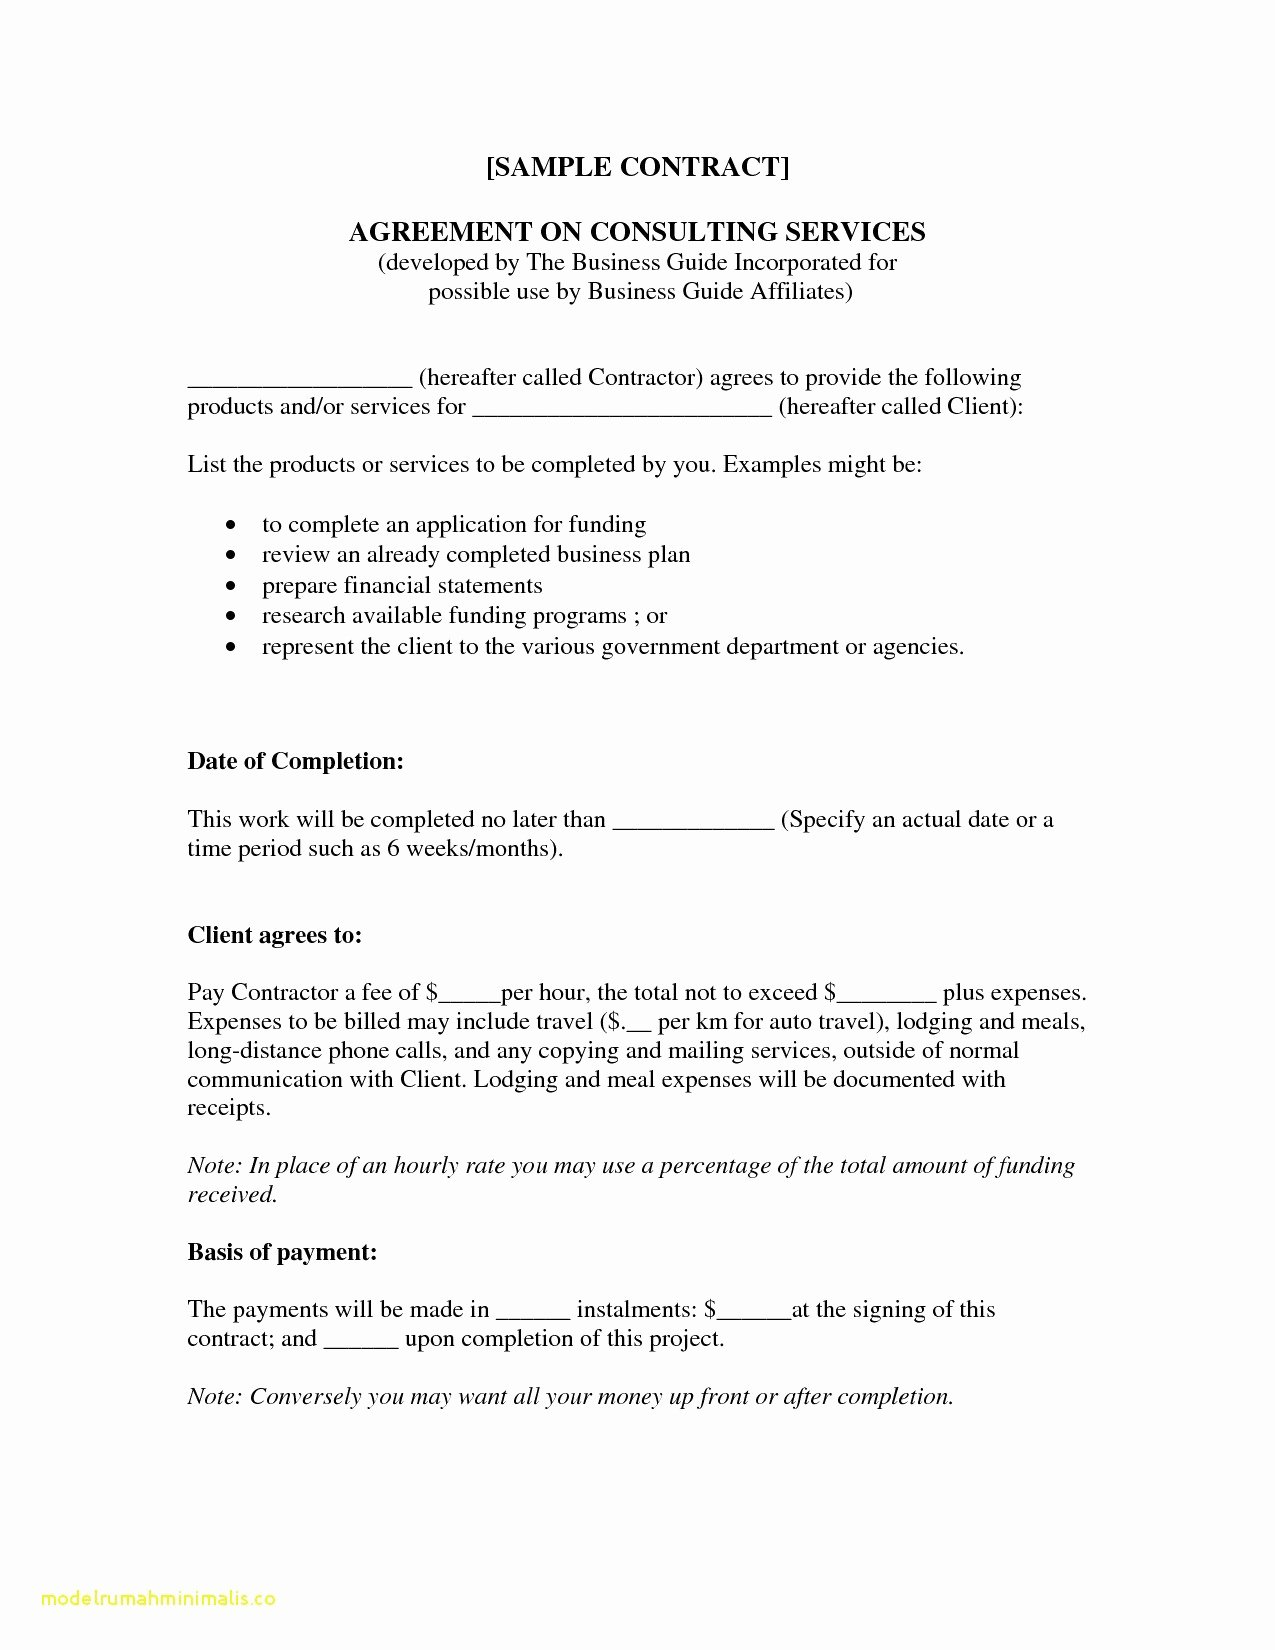 Client Service Agreement Template Lovely Memorandum Understanding Between Two Parties for